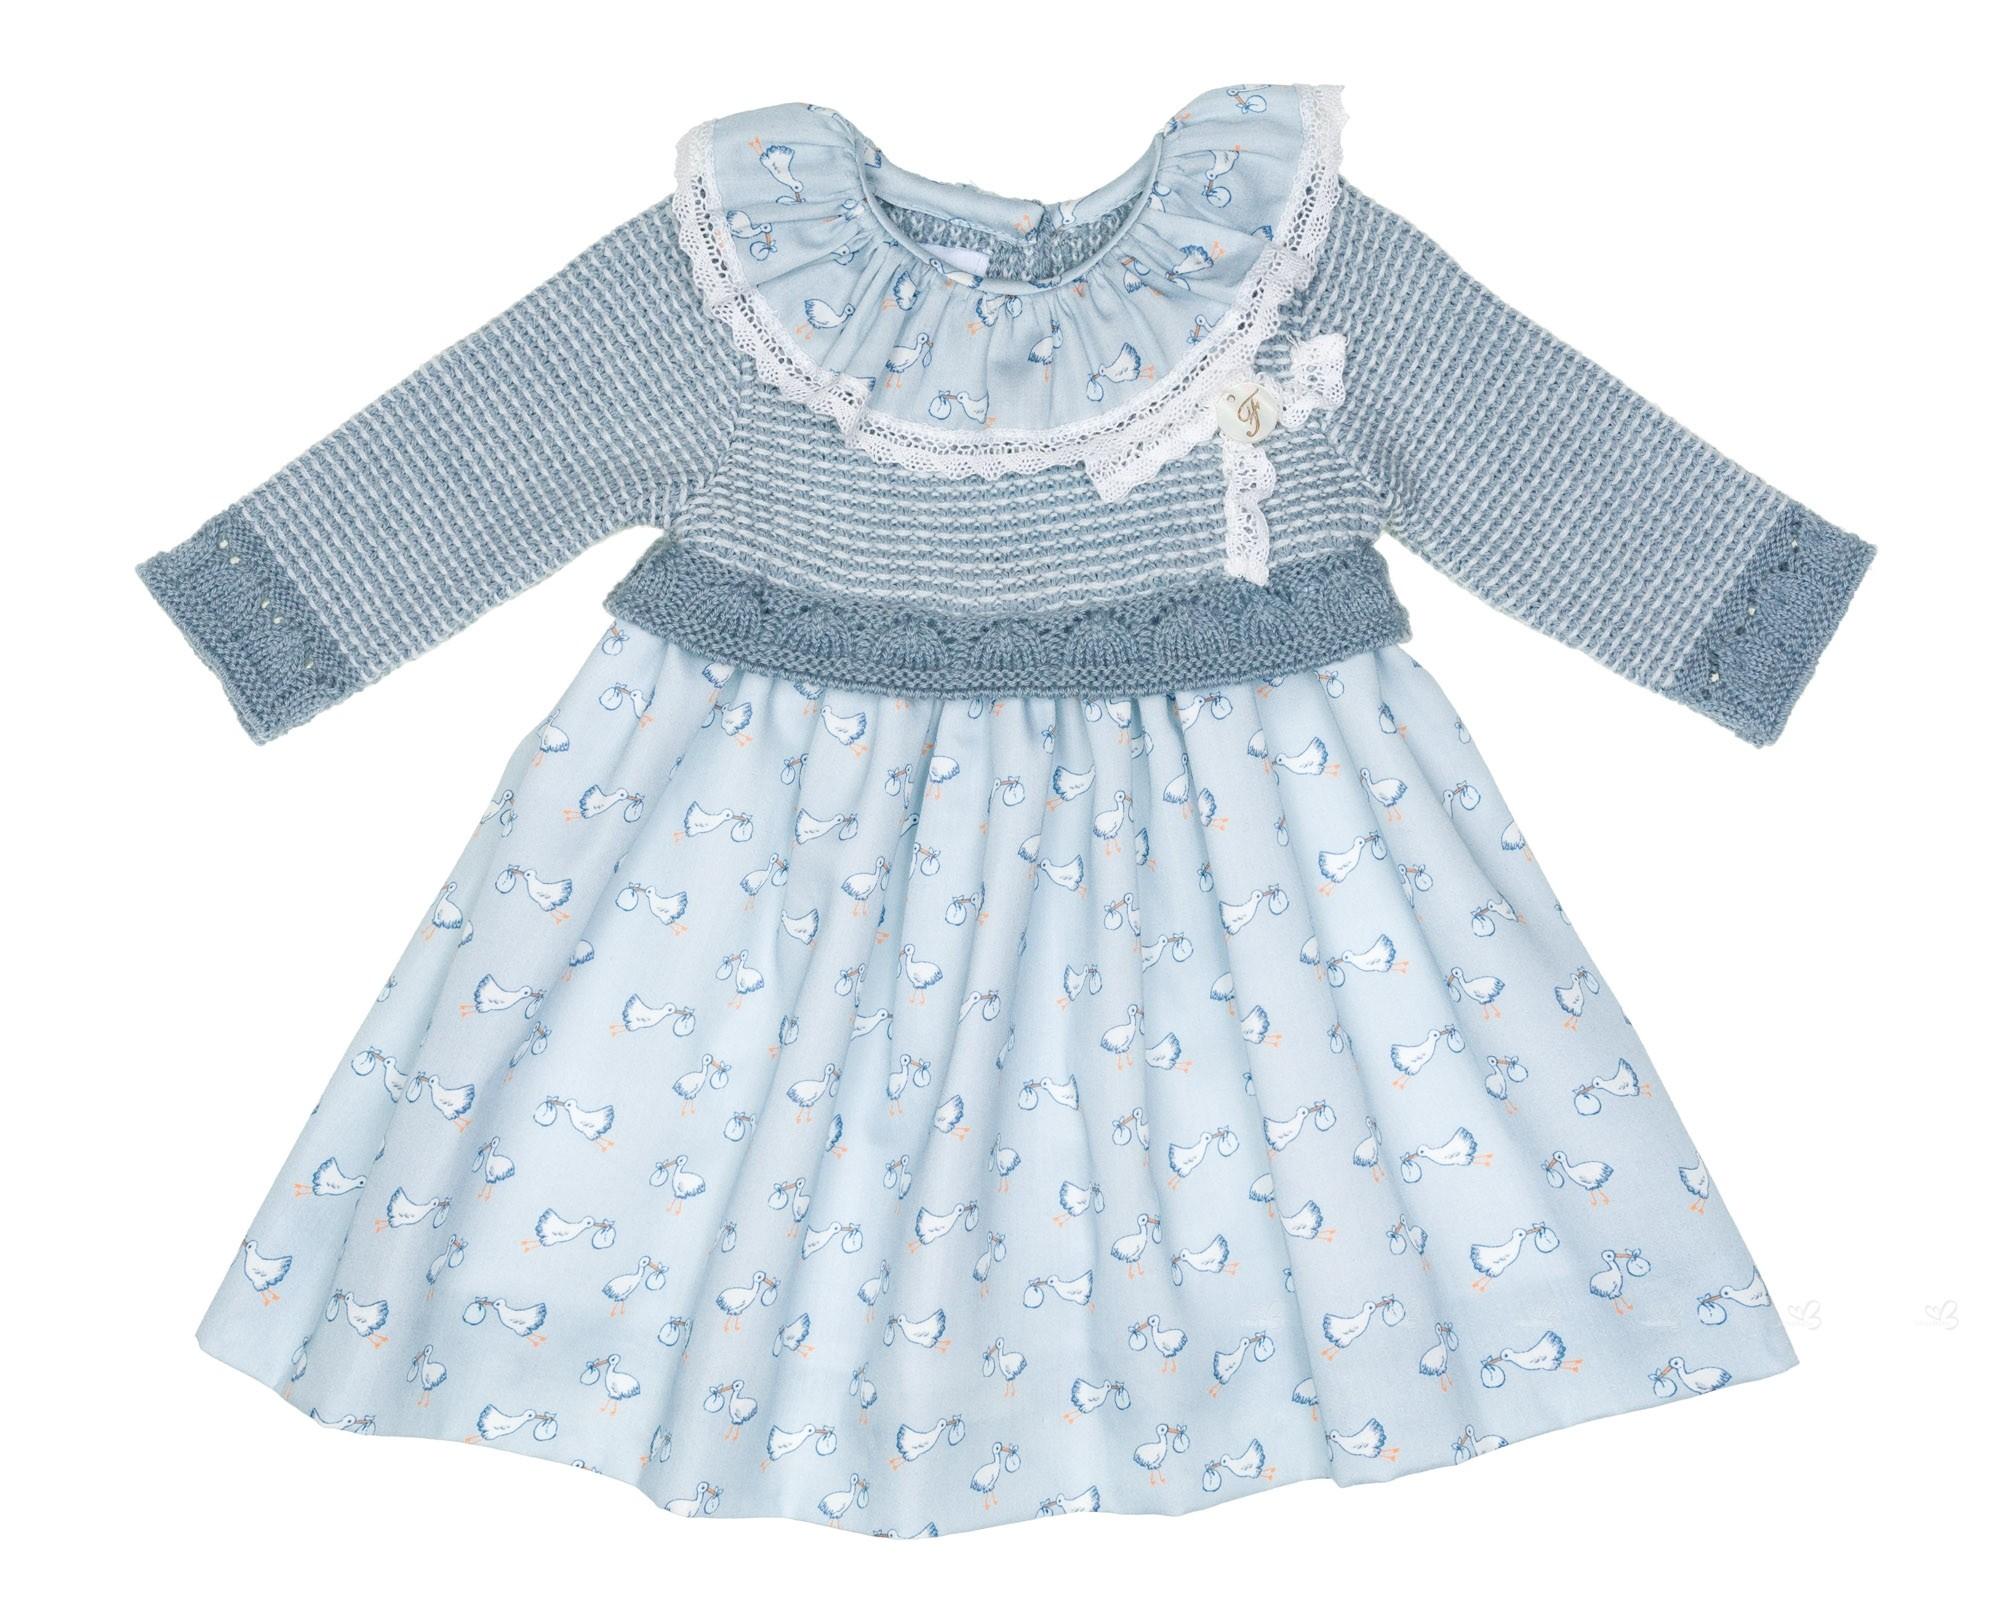 Baby Blue Knitted Stork Dress